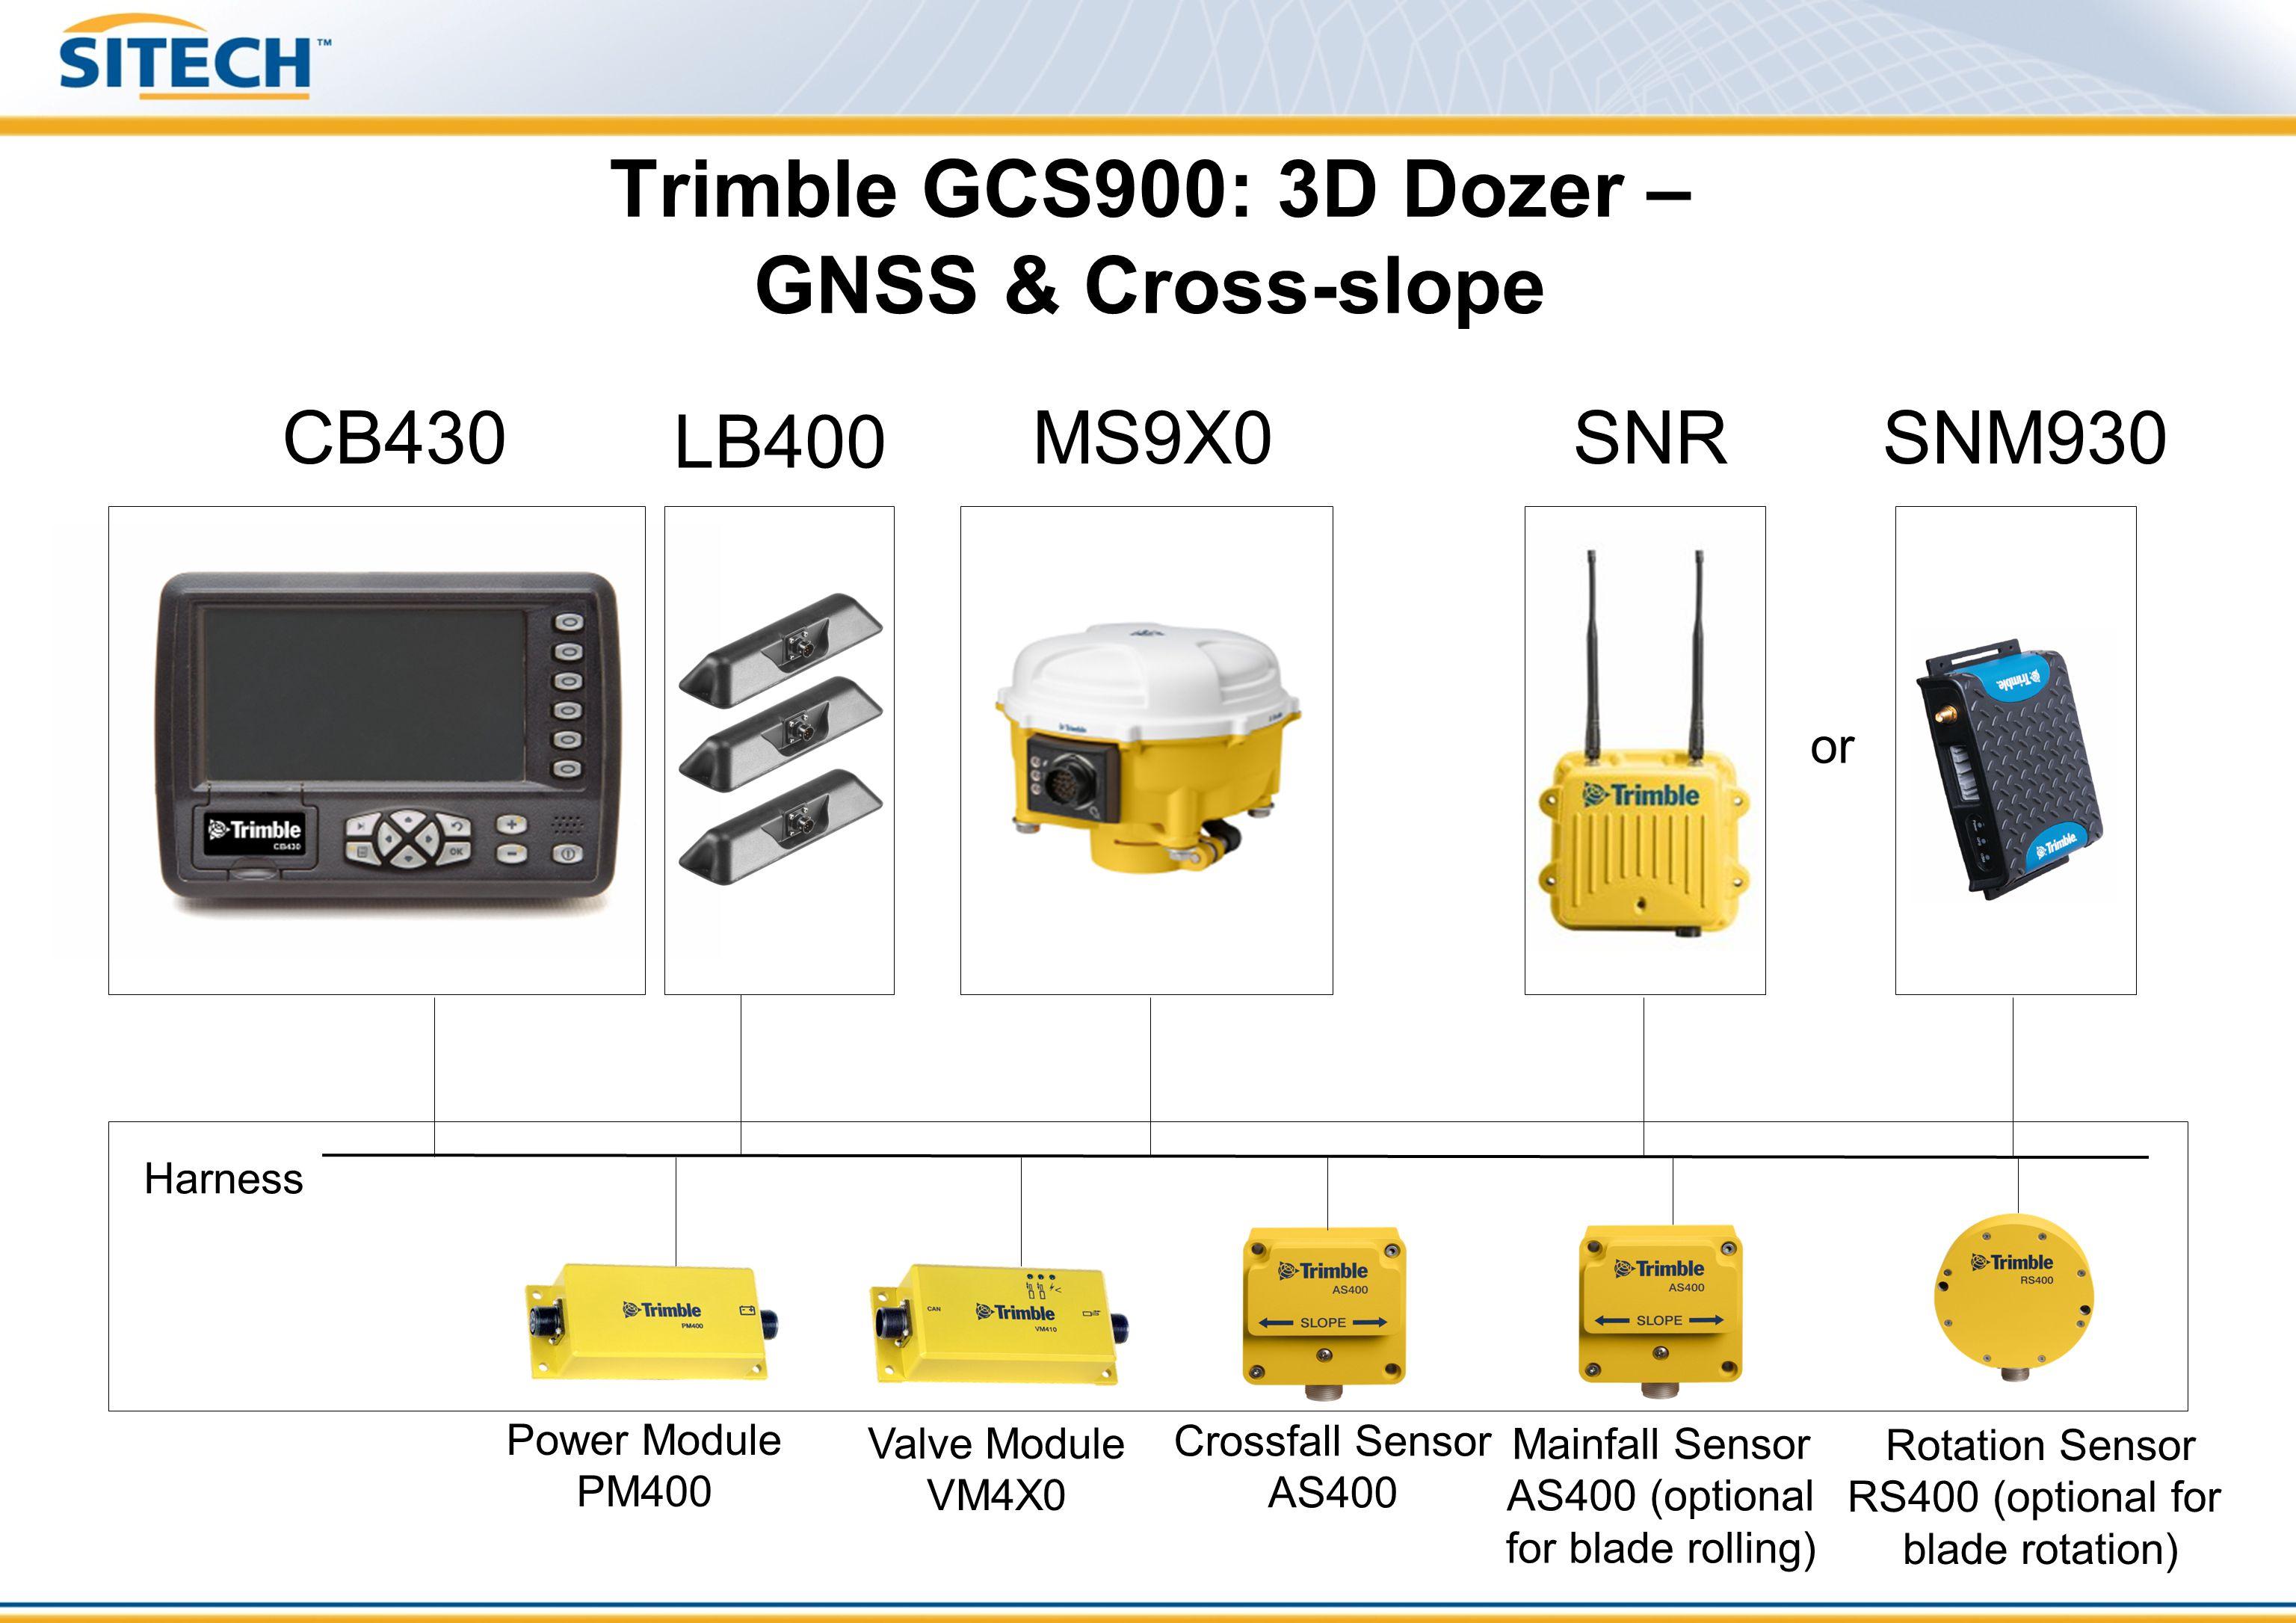 Trimble CCS900: 3D Soil Compactor – UTS Harness Power Module PM400 Compaction Sensor CM310 (opt) Crossfall Sensor AS400 (opt) CB430 LB400 SNRSNM930 or MT900